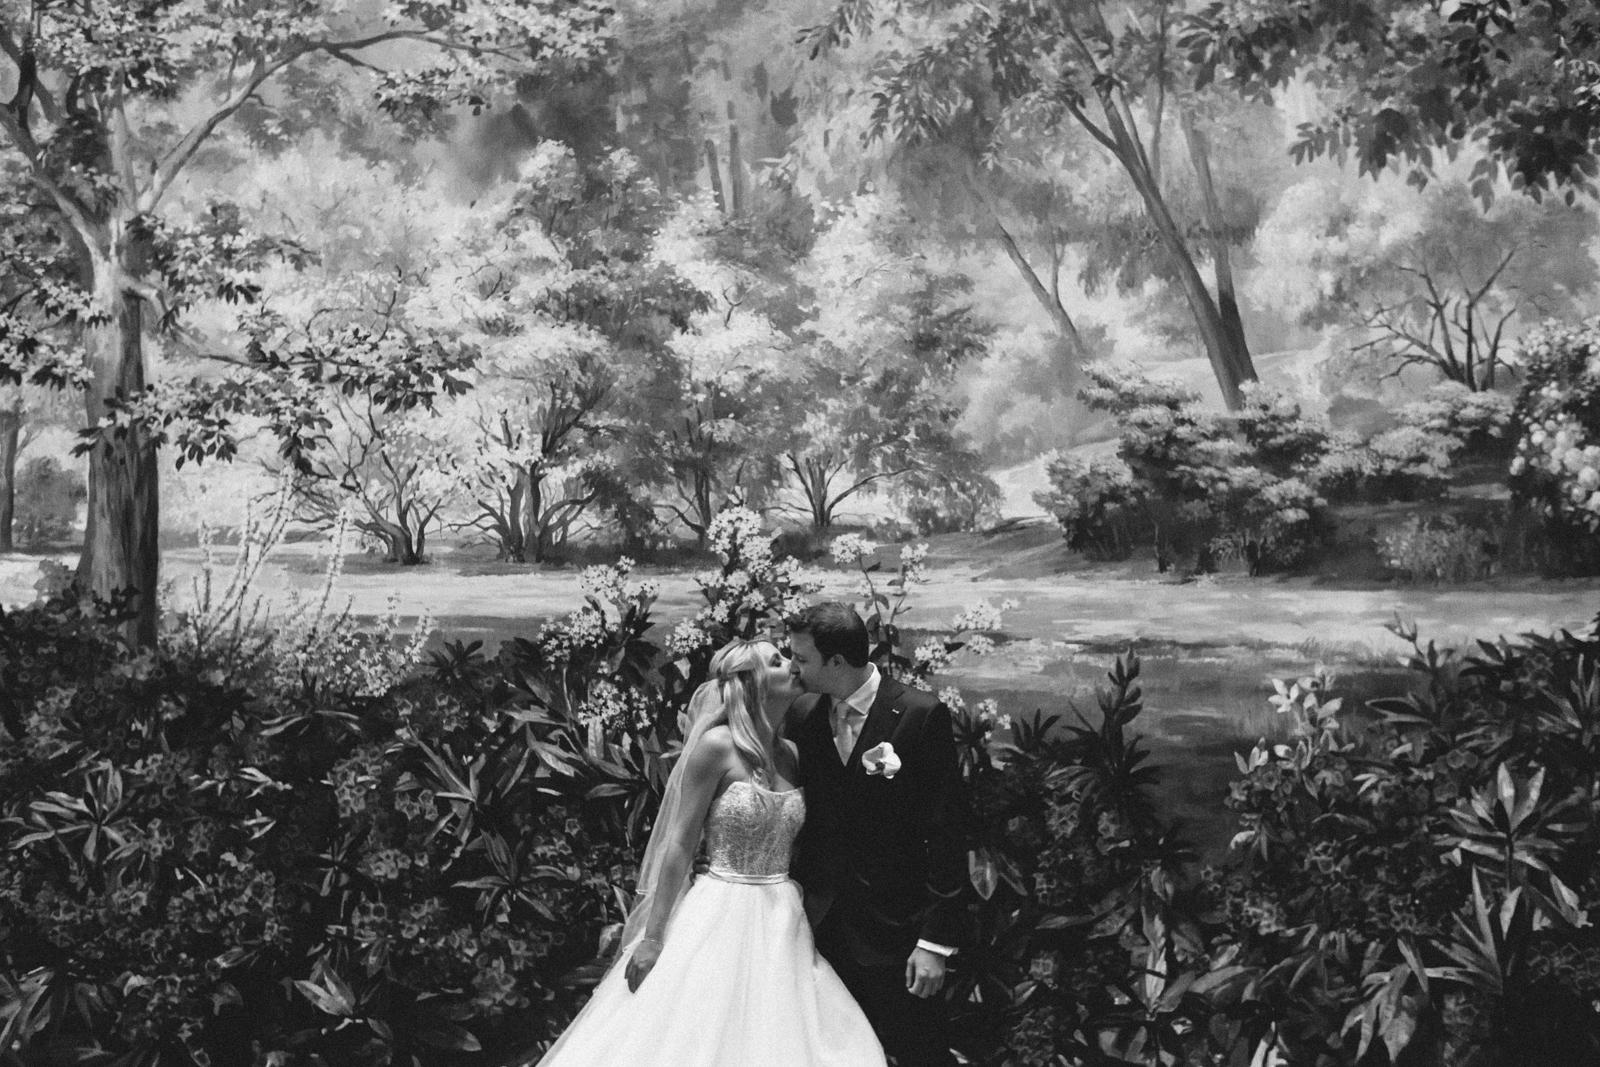 NYC Wedding Photography Sofitel Central Park Brooklyn Photographer Boris Zaretsky _B2C2061.jpg